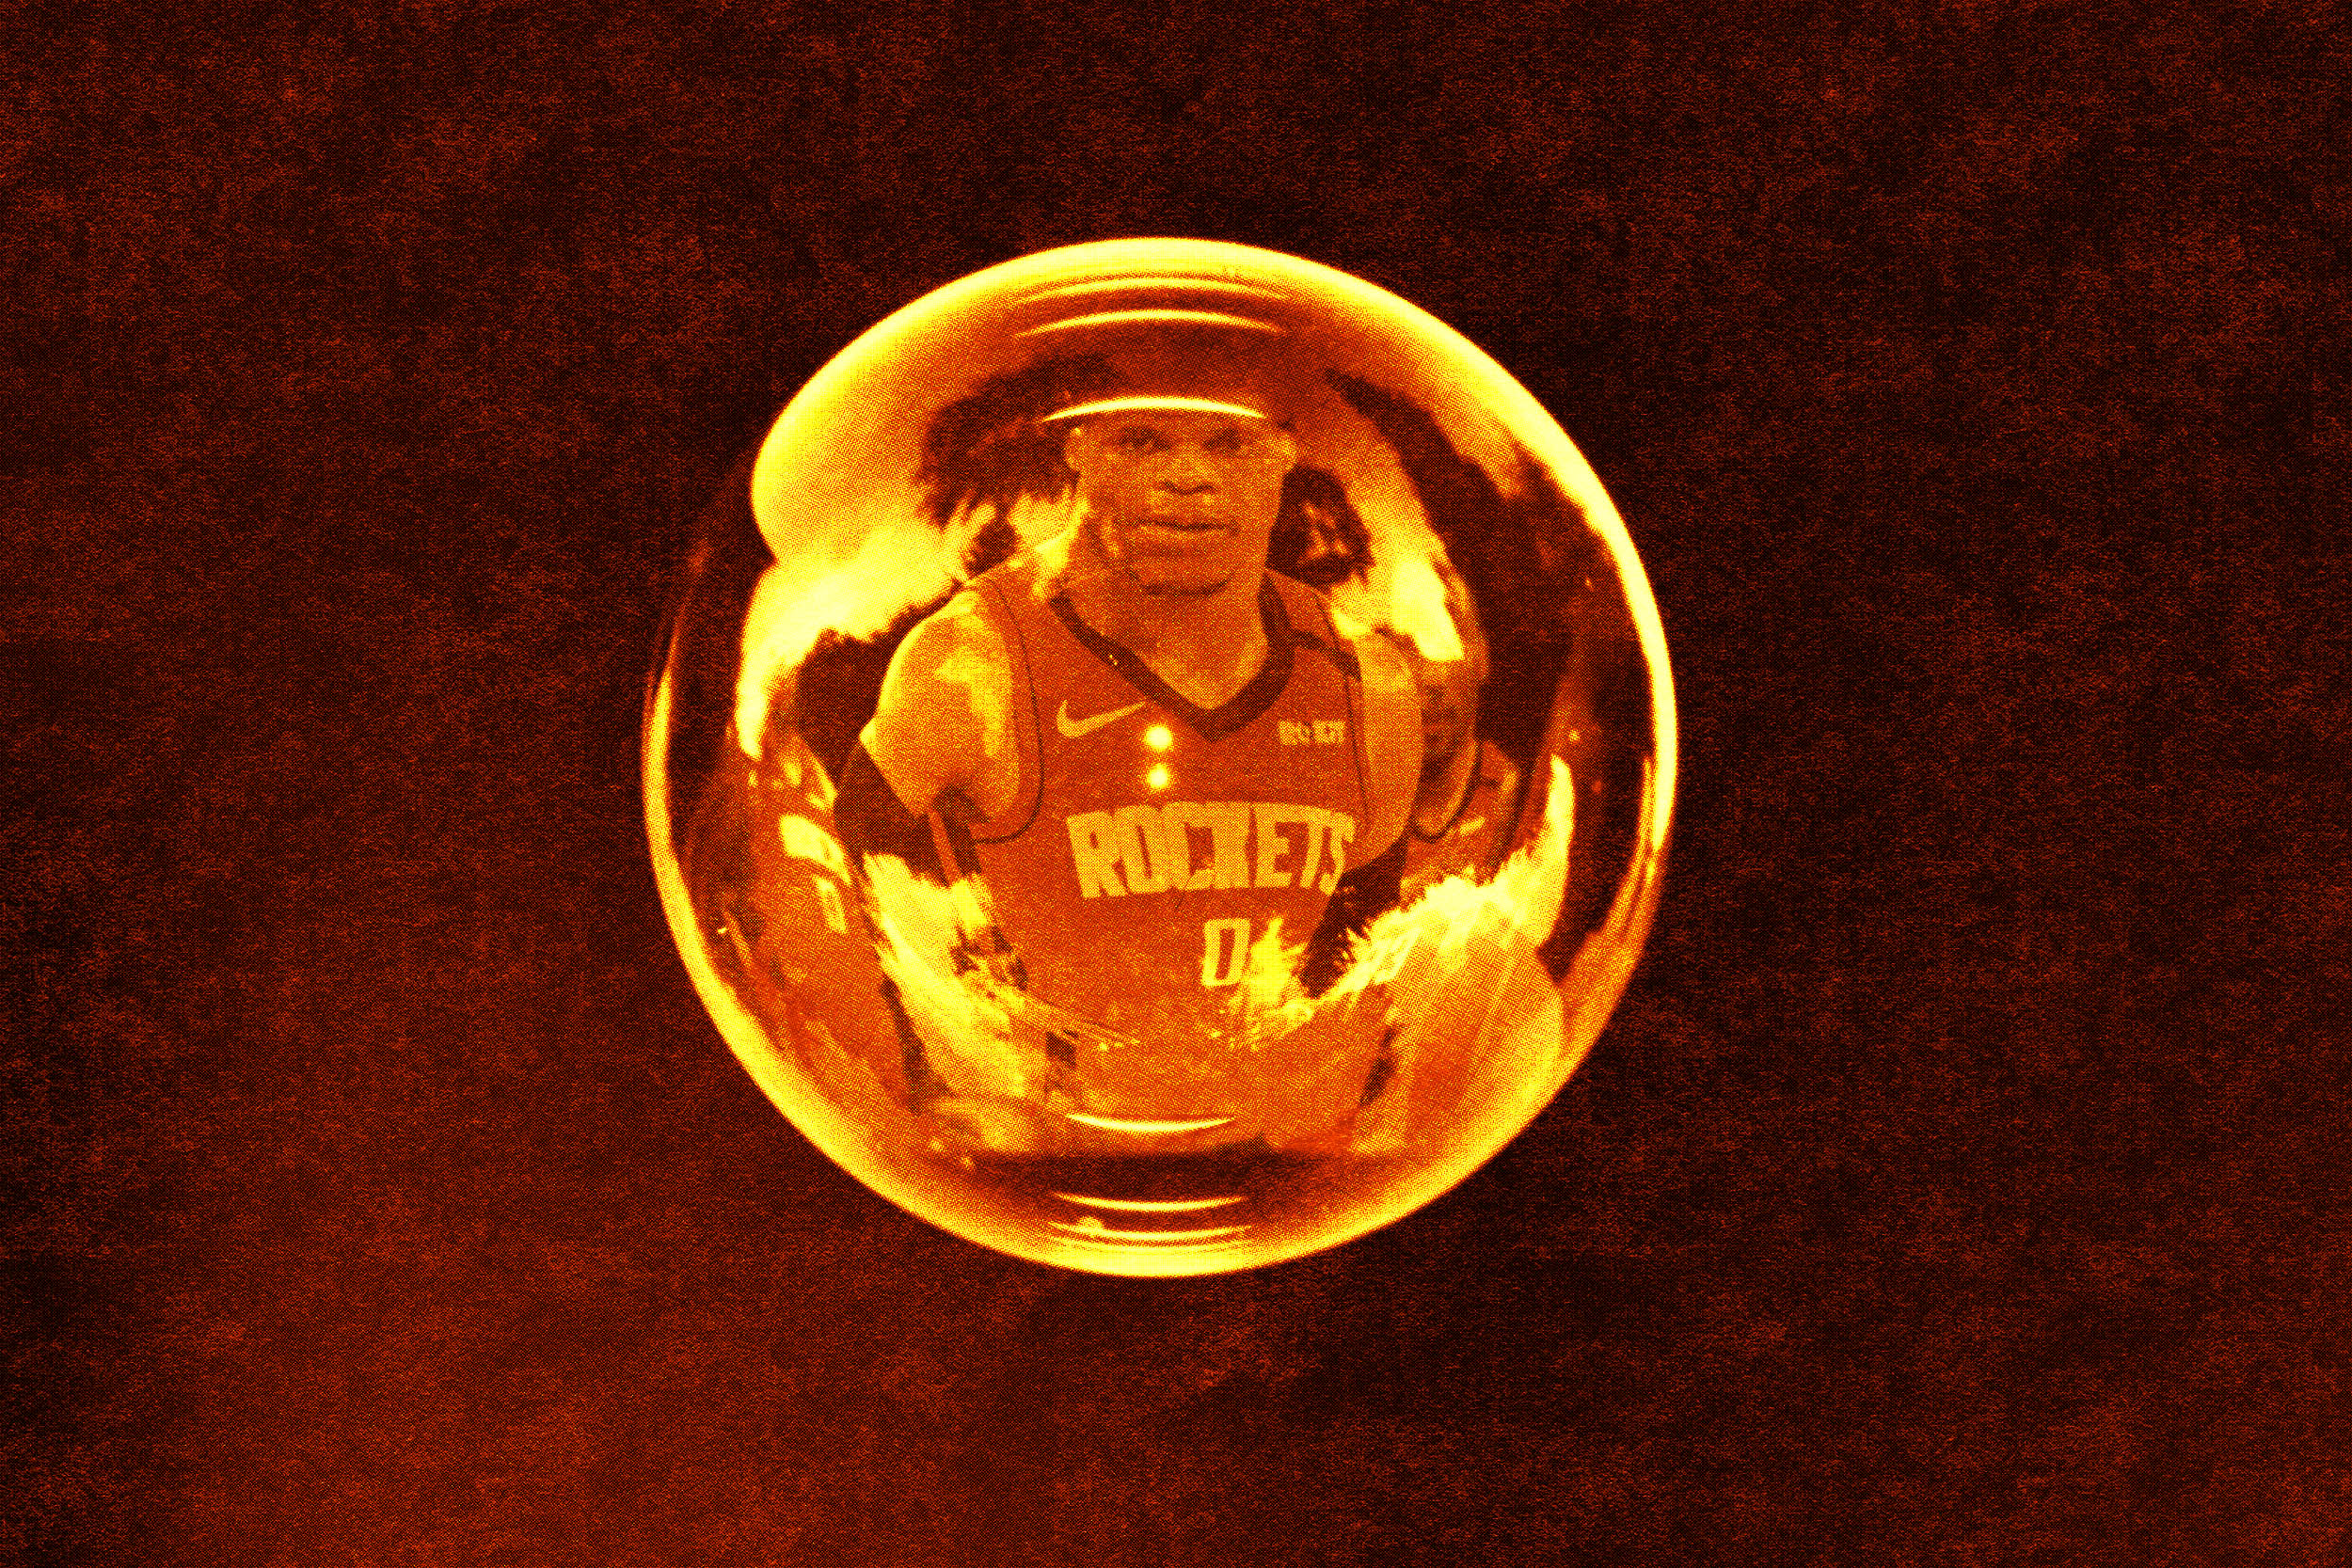 The small-ball Houston Rockets: How the bubble burst